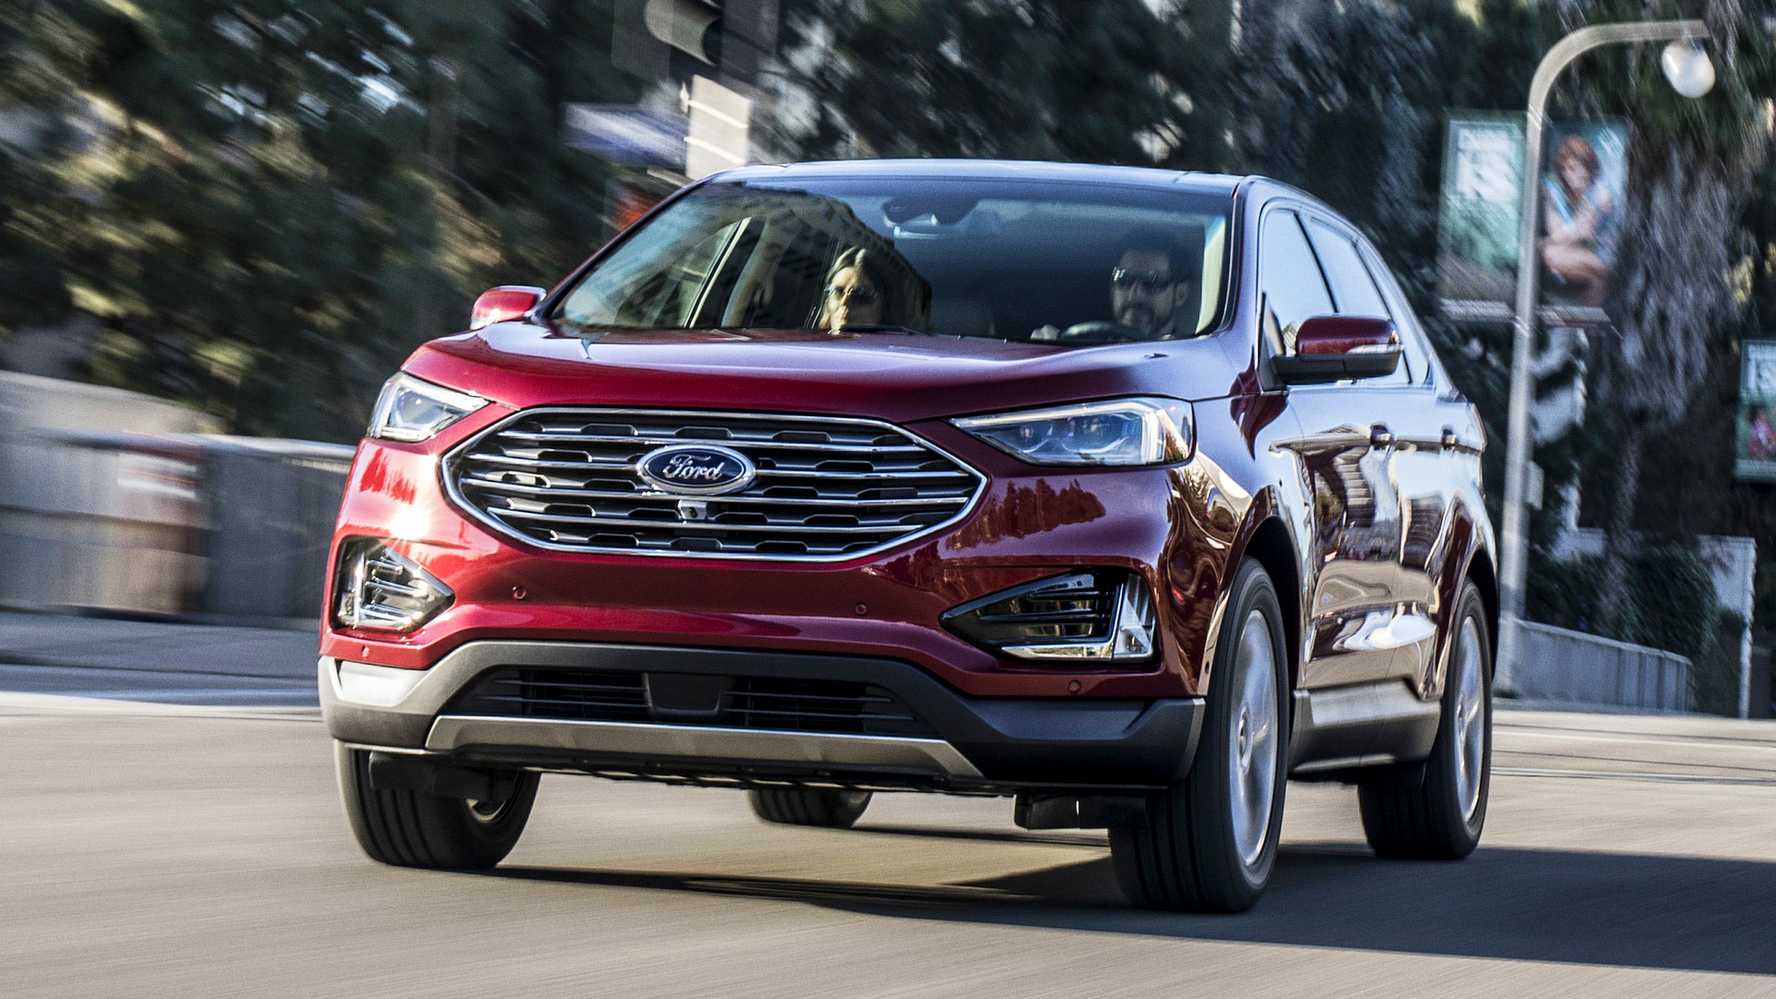 Ford-Edge-Good-Auto-Blog.jpg